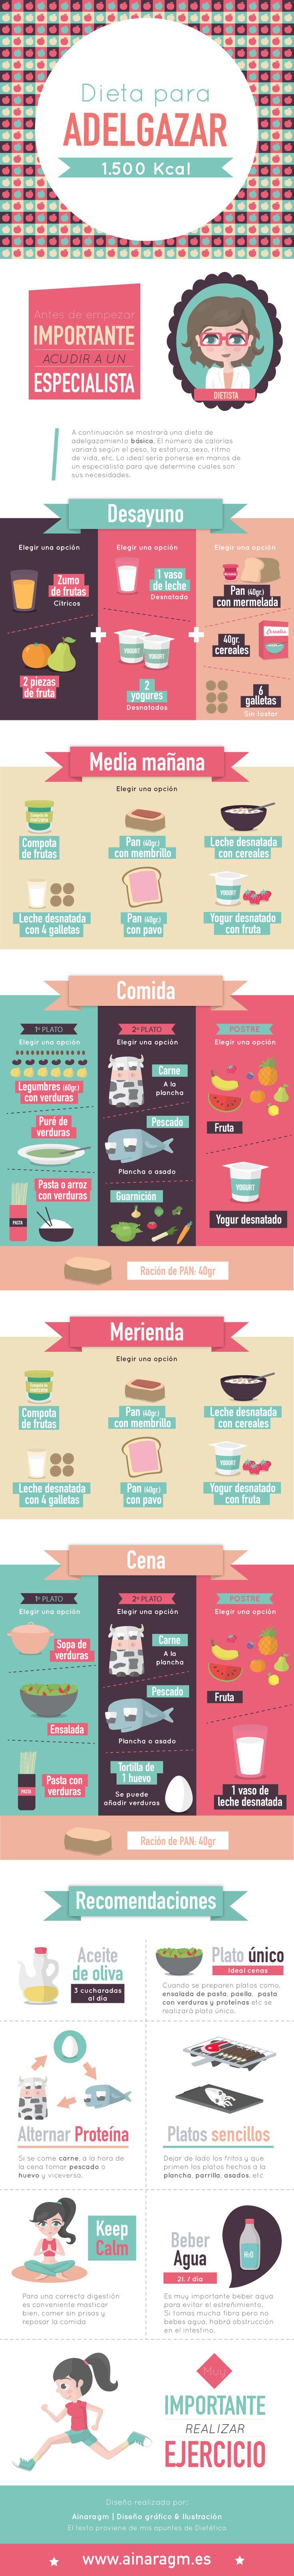 #Infografia sobre una dieta de adelgazamiento #adelgazar  http://mejoresremediosnaturales.blogspot.com/